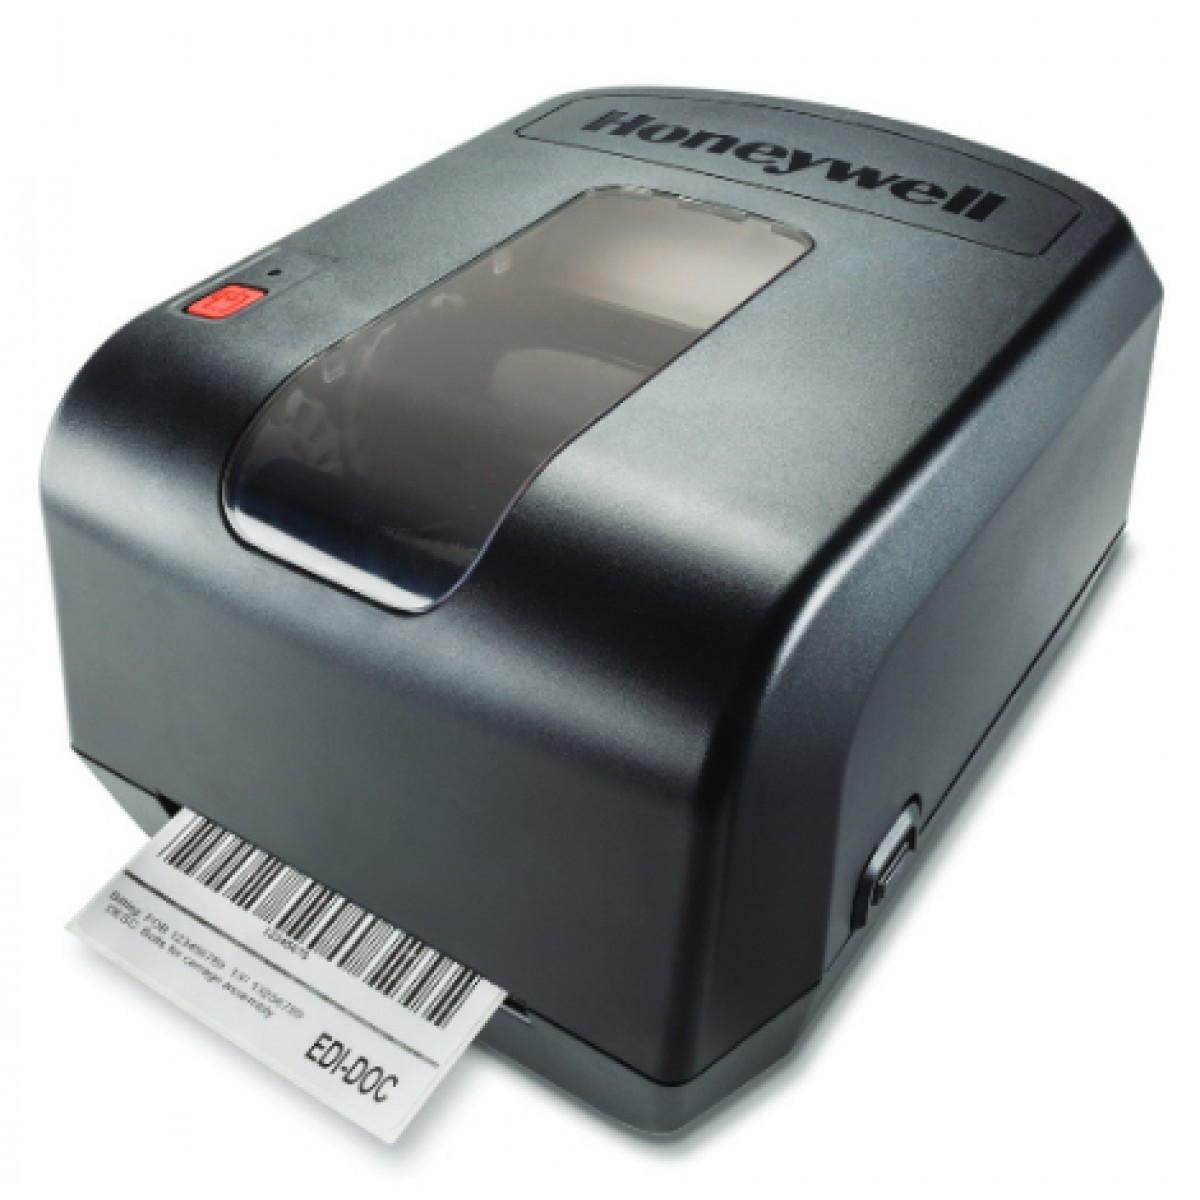 Термотрансферный принтер штрих-кода Honeywell PC42T Thermal Transfer 203DPI USB